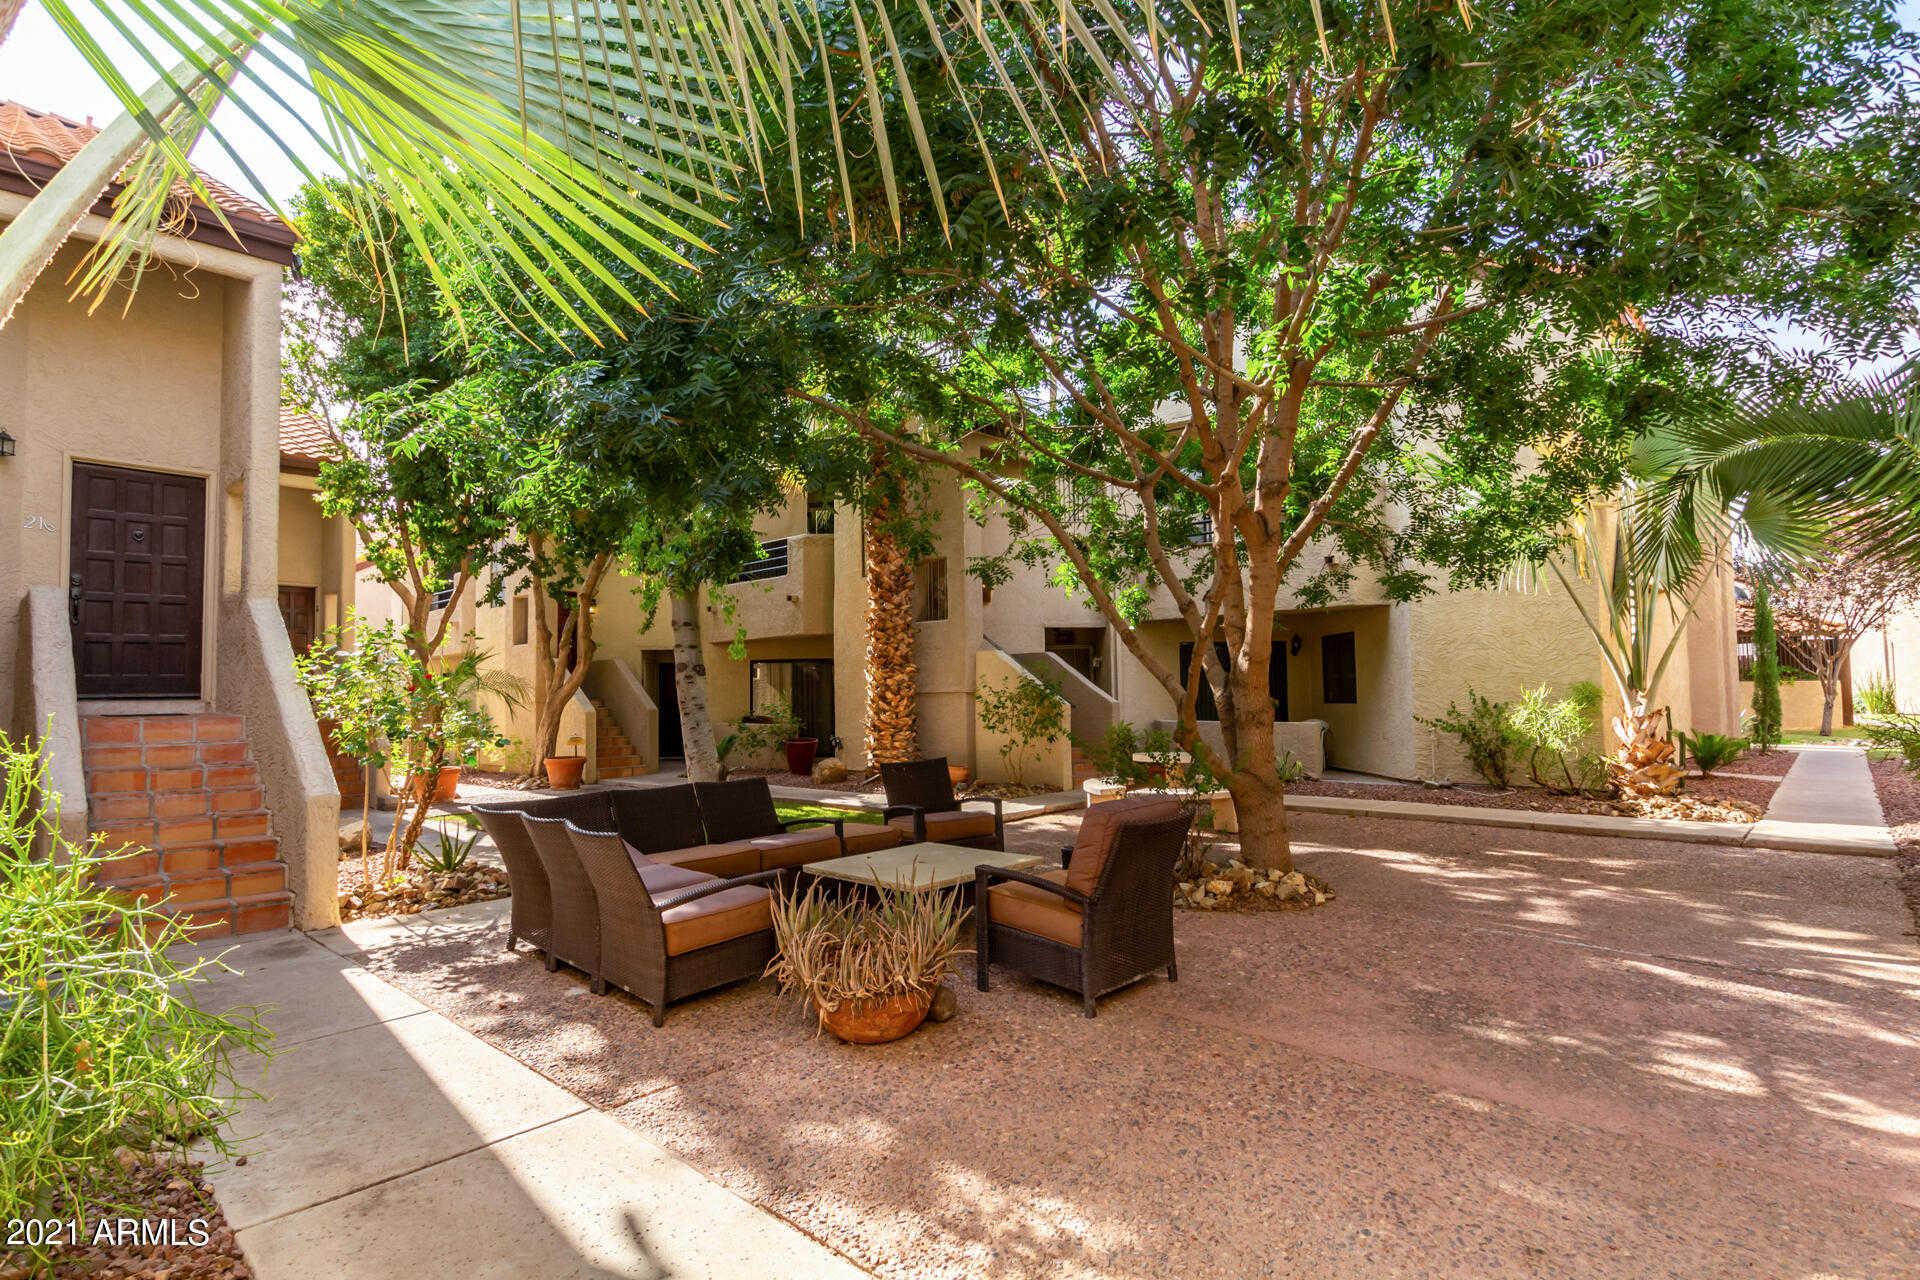 $310,000 - 2Br/1Ba -  for Sale in Joshua Tree Condominiums, Paradise Valley